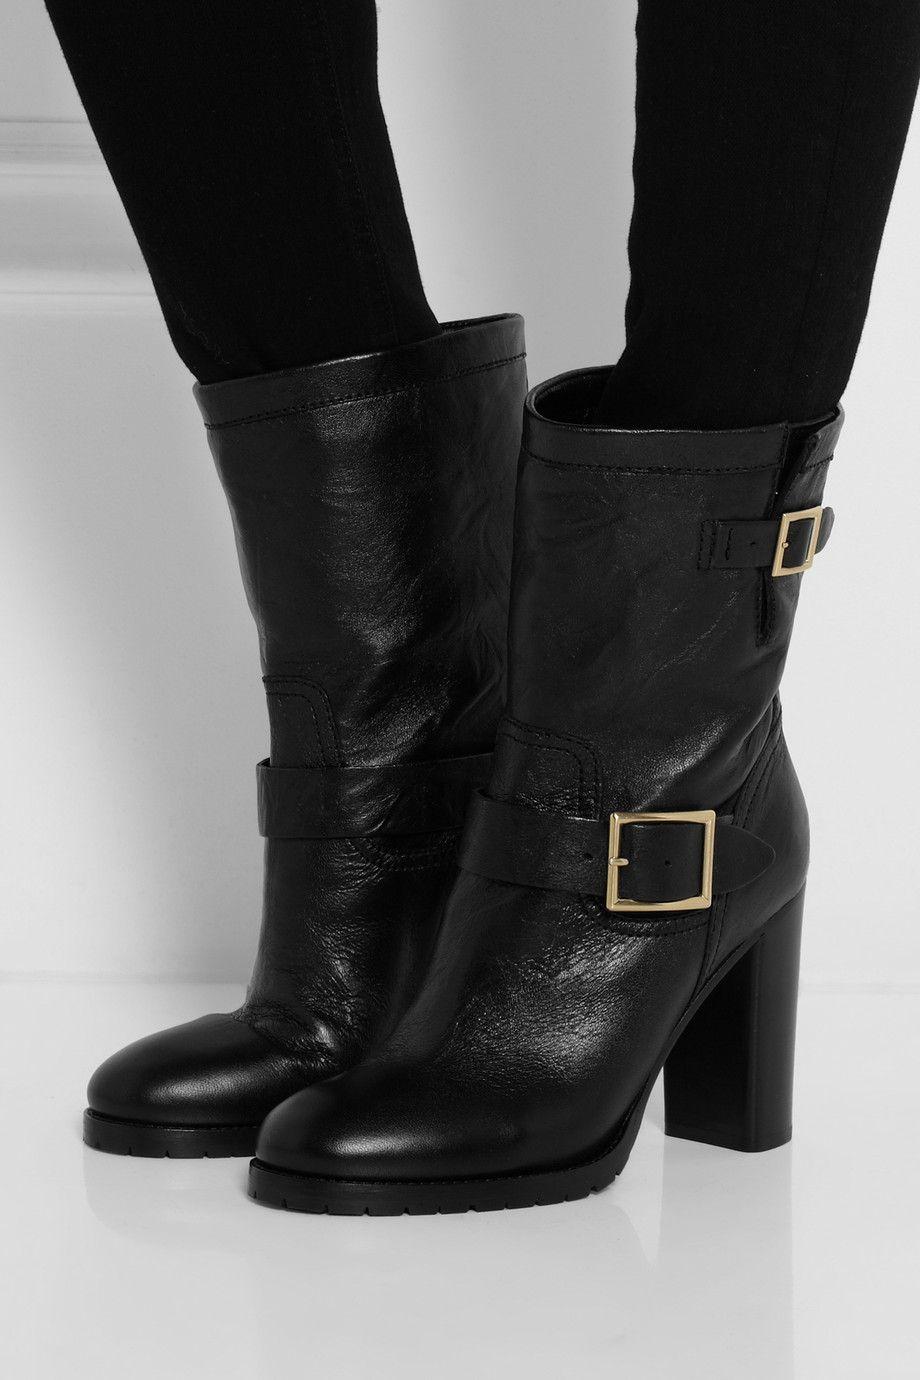 Jimmy Choo Dart Ankle Boots 2014 new sale online 3NyXWfiw95